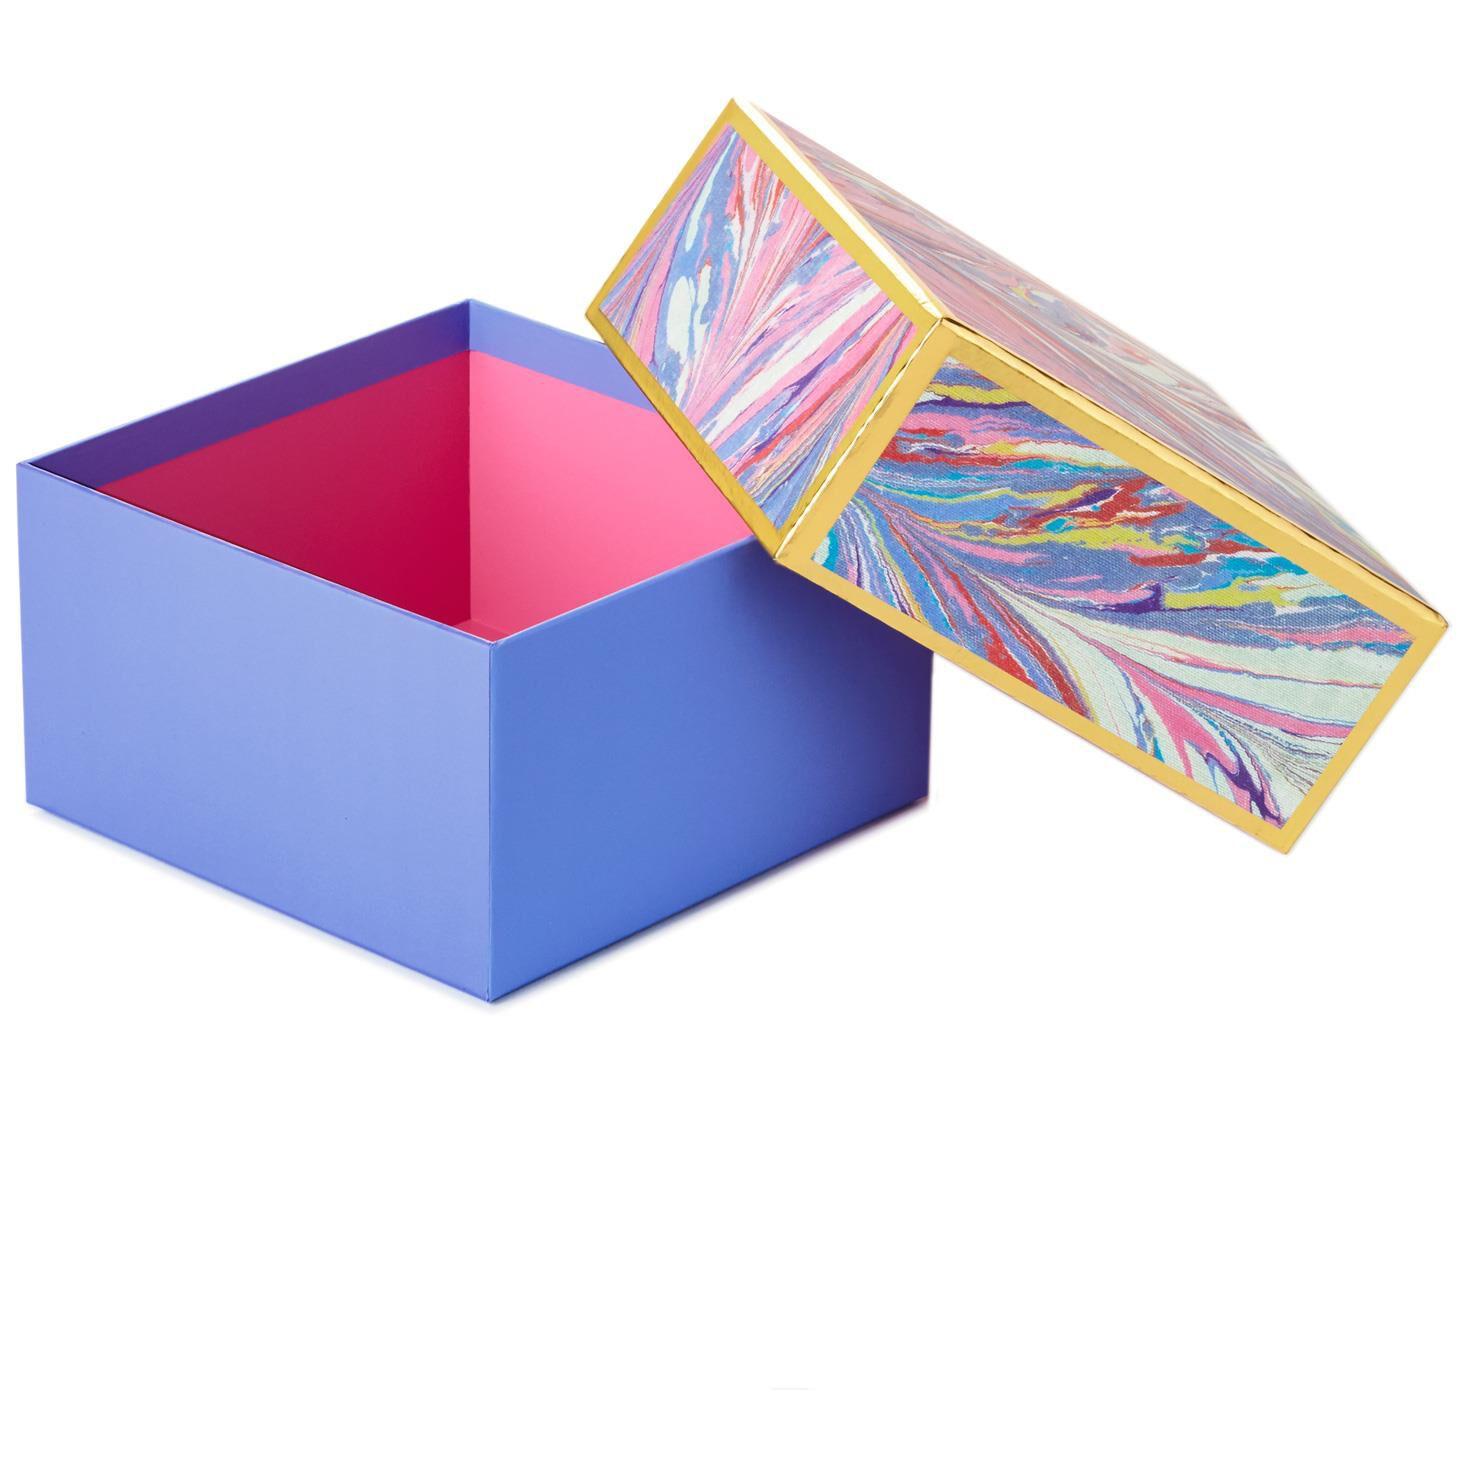 ... Periwinkle Marbled Medium Square Gift Box 7   sc 1 st  Hallmark & Periwinkle Marbled Medium Square Gift Box 7